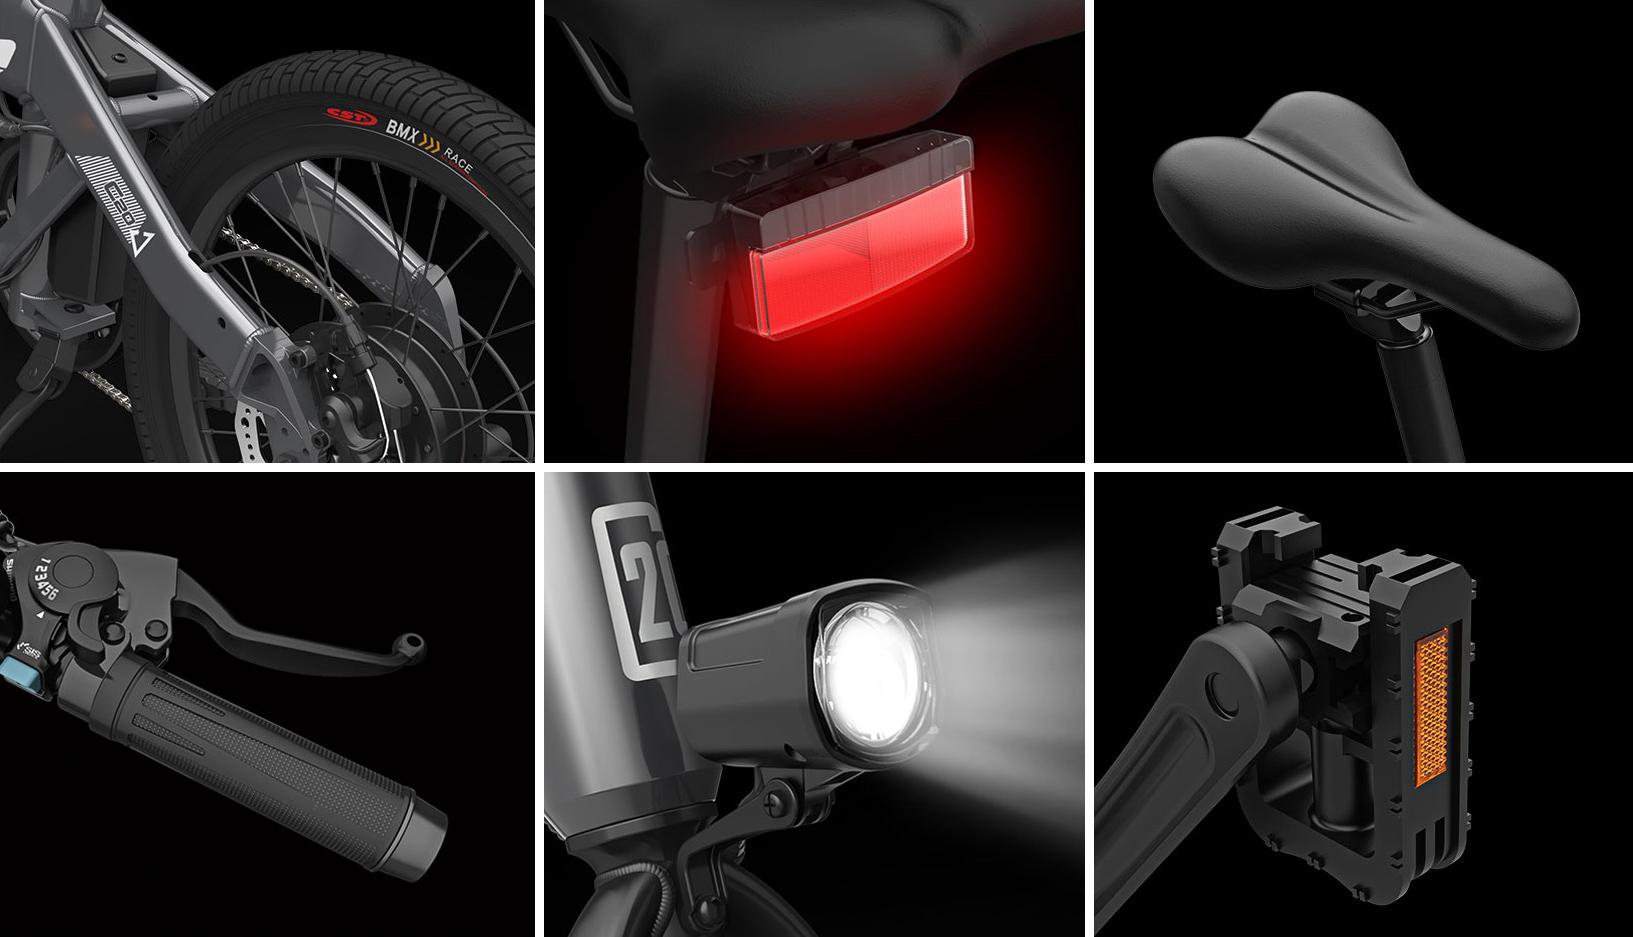 Xiaomi Himo C20, 80 km menzile sahip elektrikli bisiklet 3